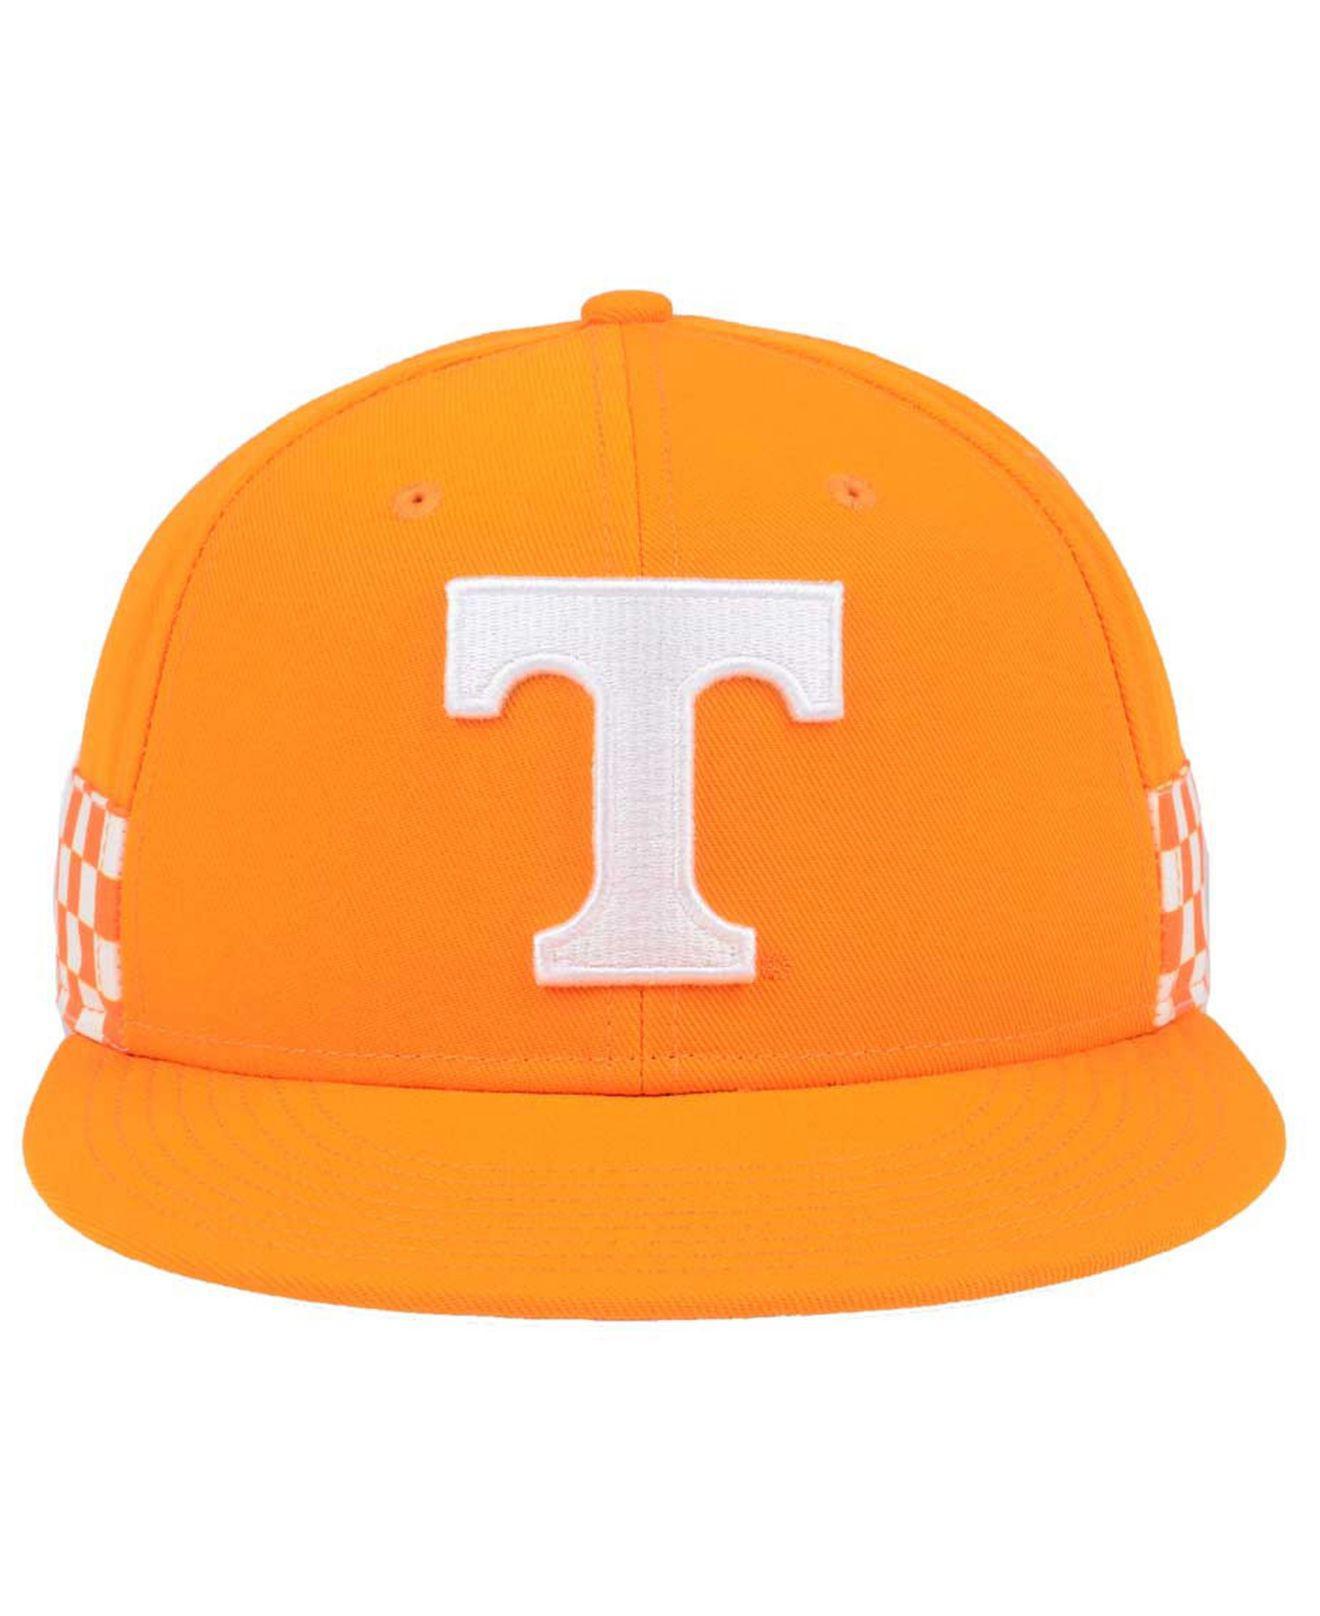 newest 3d37c 2e4ef ... france lyst nike true woven stripe snapback cap in orange for men e5940  9d148